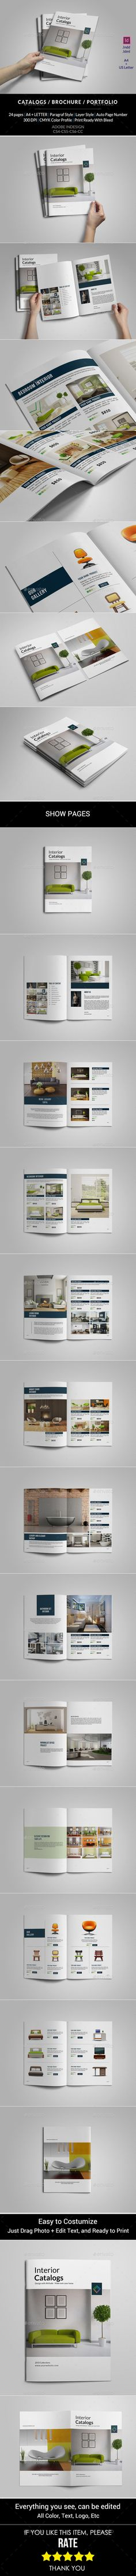 Catalogs / Brochure / Portfolio Brochure Template #brochure Download: http://graphicriver.net/item/catalogs-brochure-portfolio/11365404?ref=ksioks